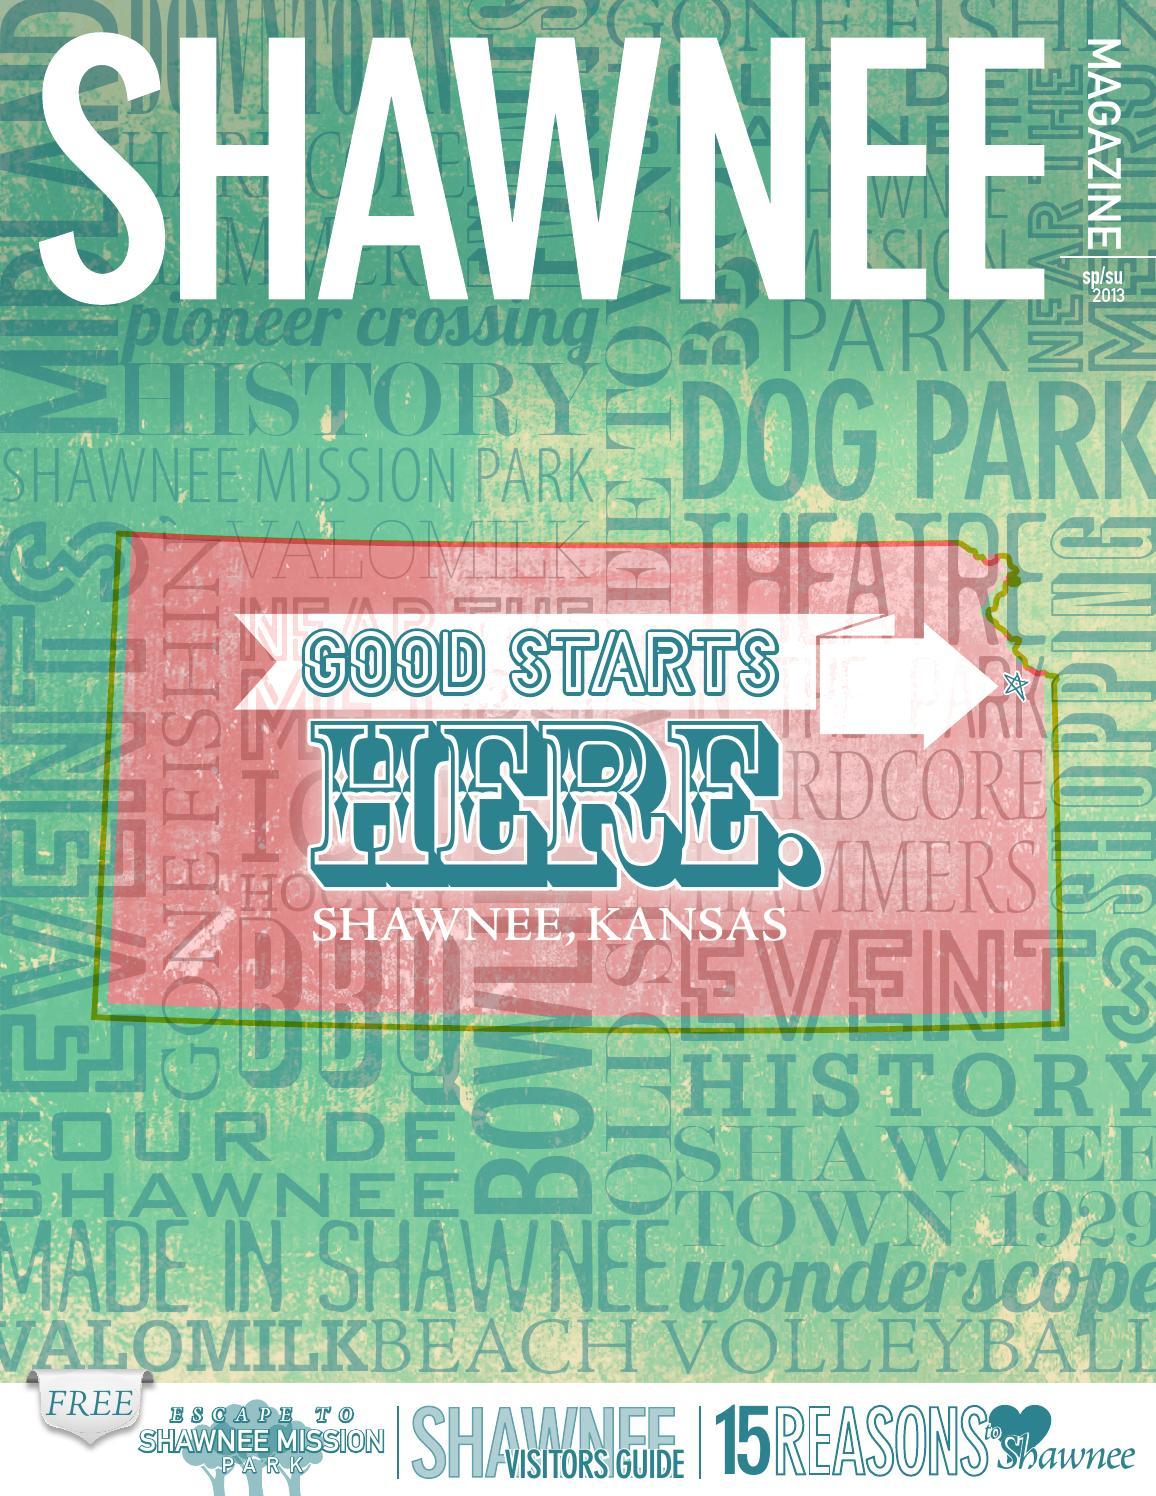 9cd717f1dca40 SHAWNEE MAGAZINE by Sunflower Publishing - issuu